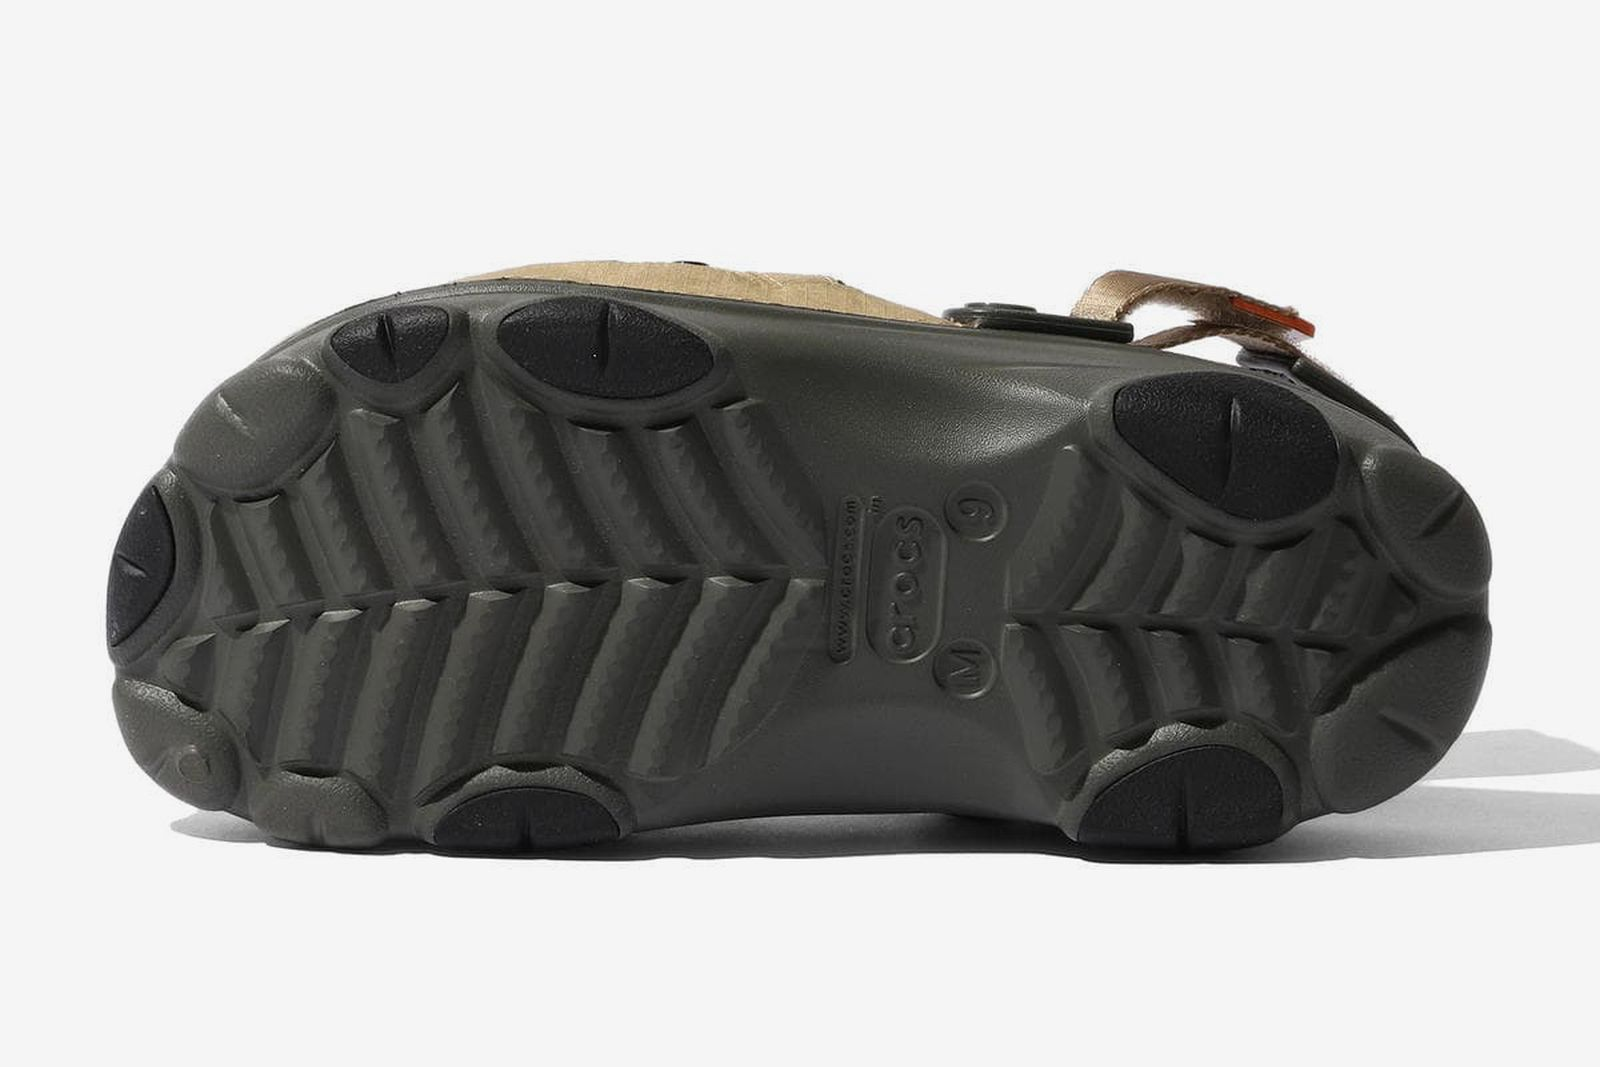 beams-crocs-spring-2020-release-date-price-1-10